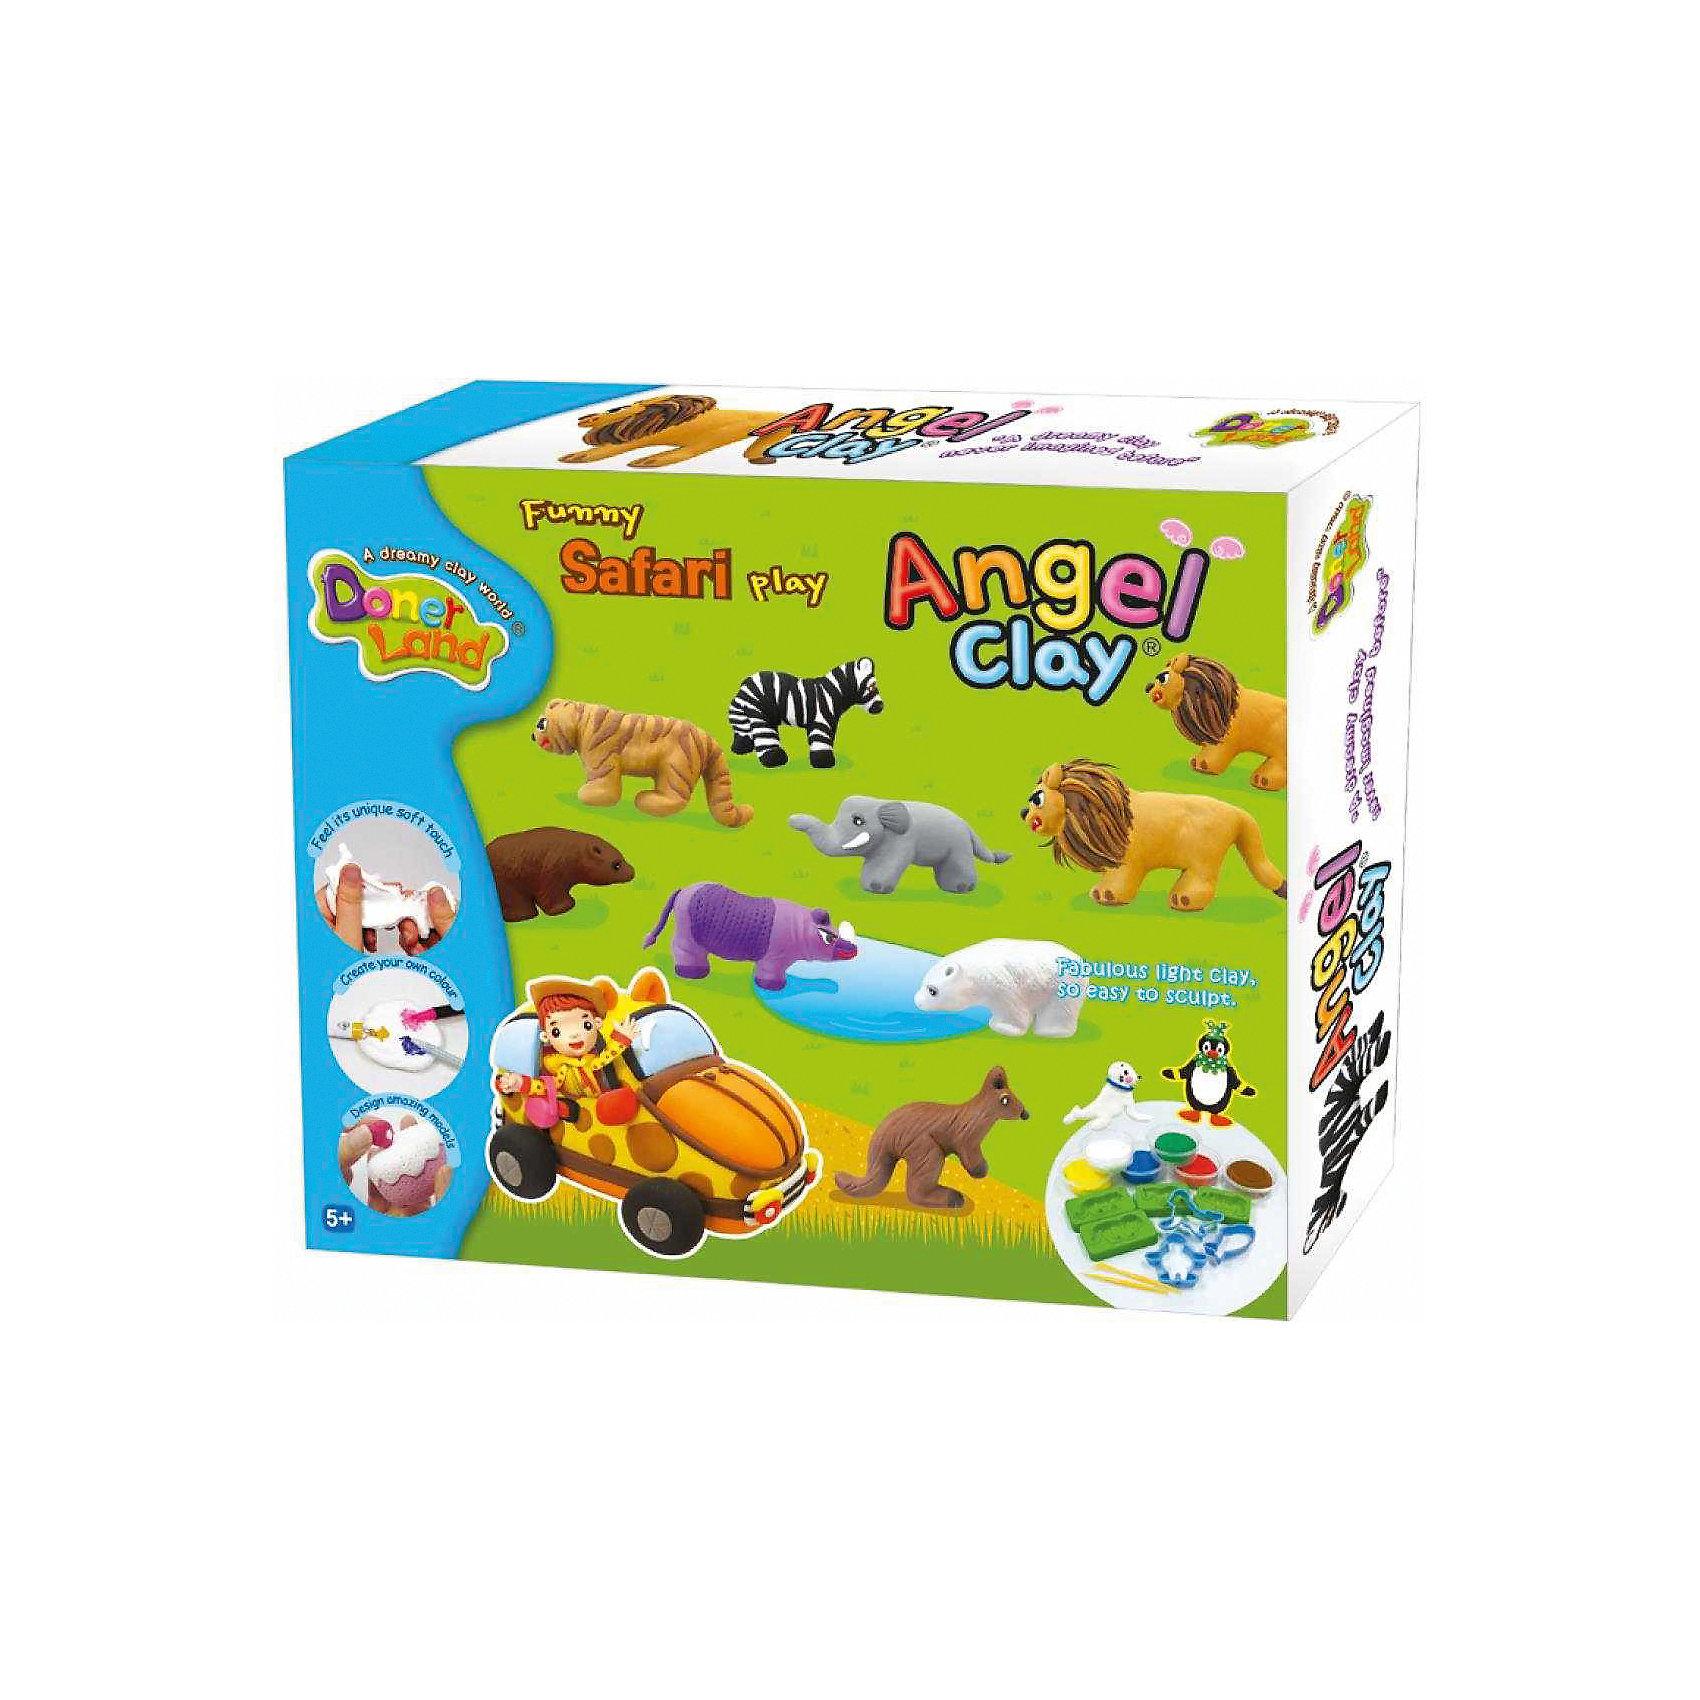 Angel Clay Игровой набор для лепки из глины Funny Safari, Angel Clay набор для лепки donerland angel clay funny safari aa14021